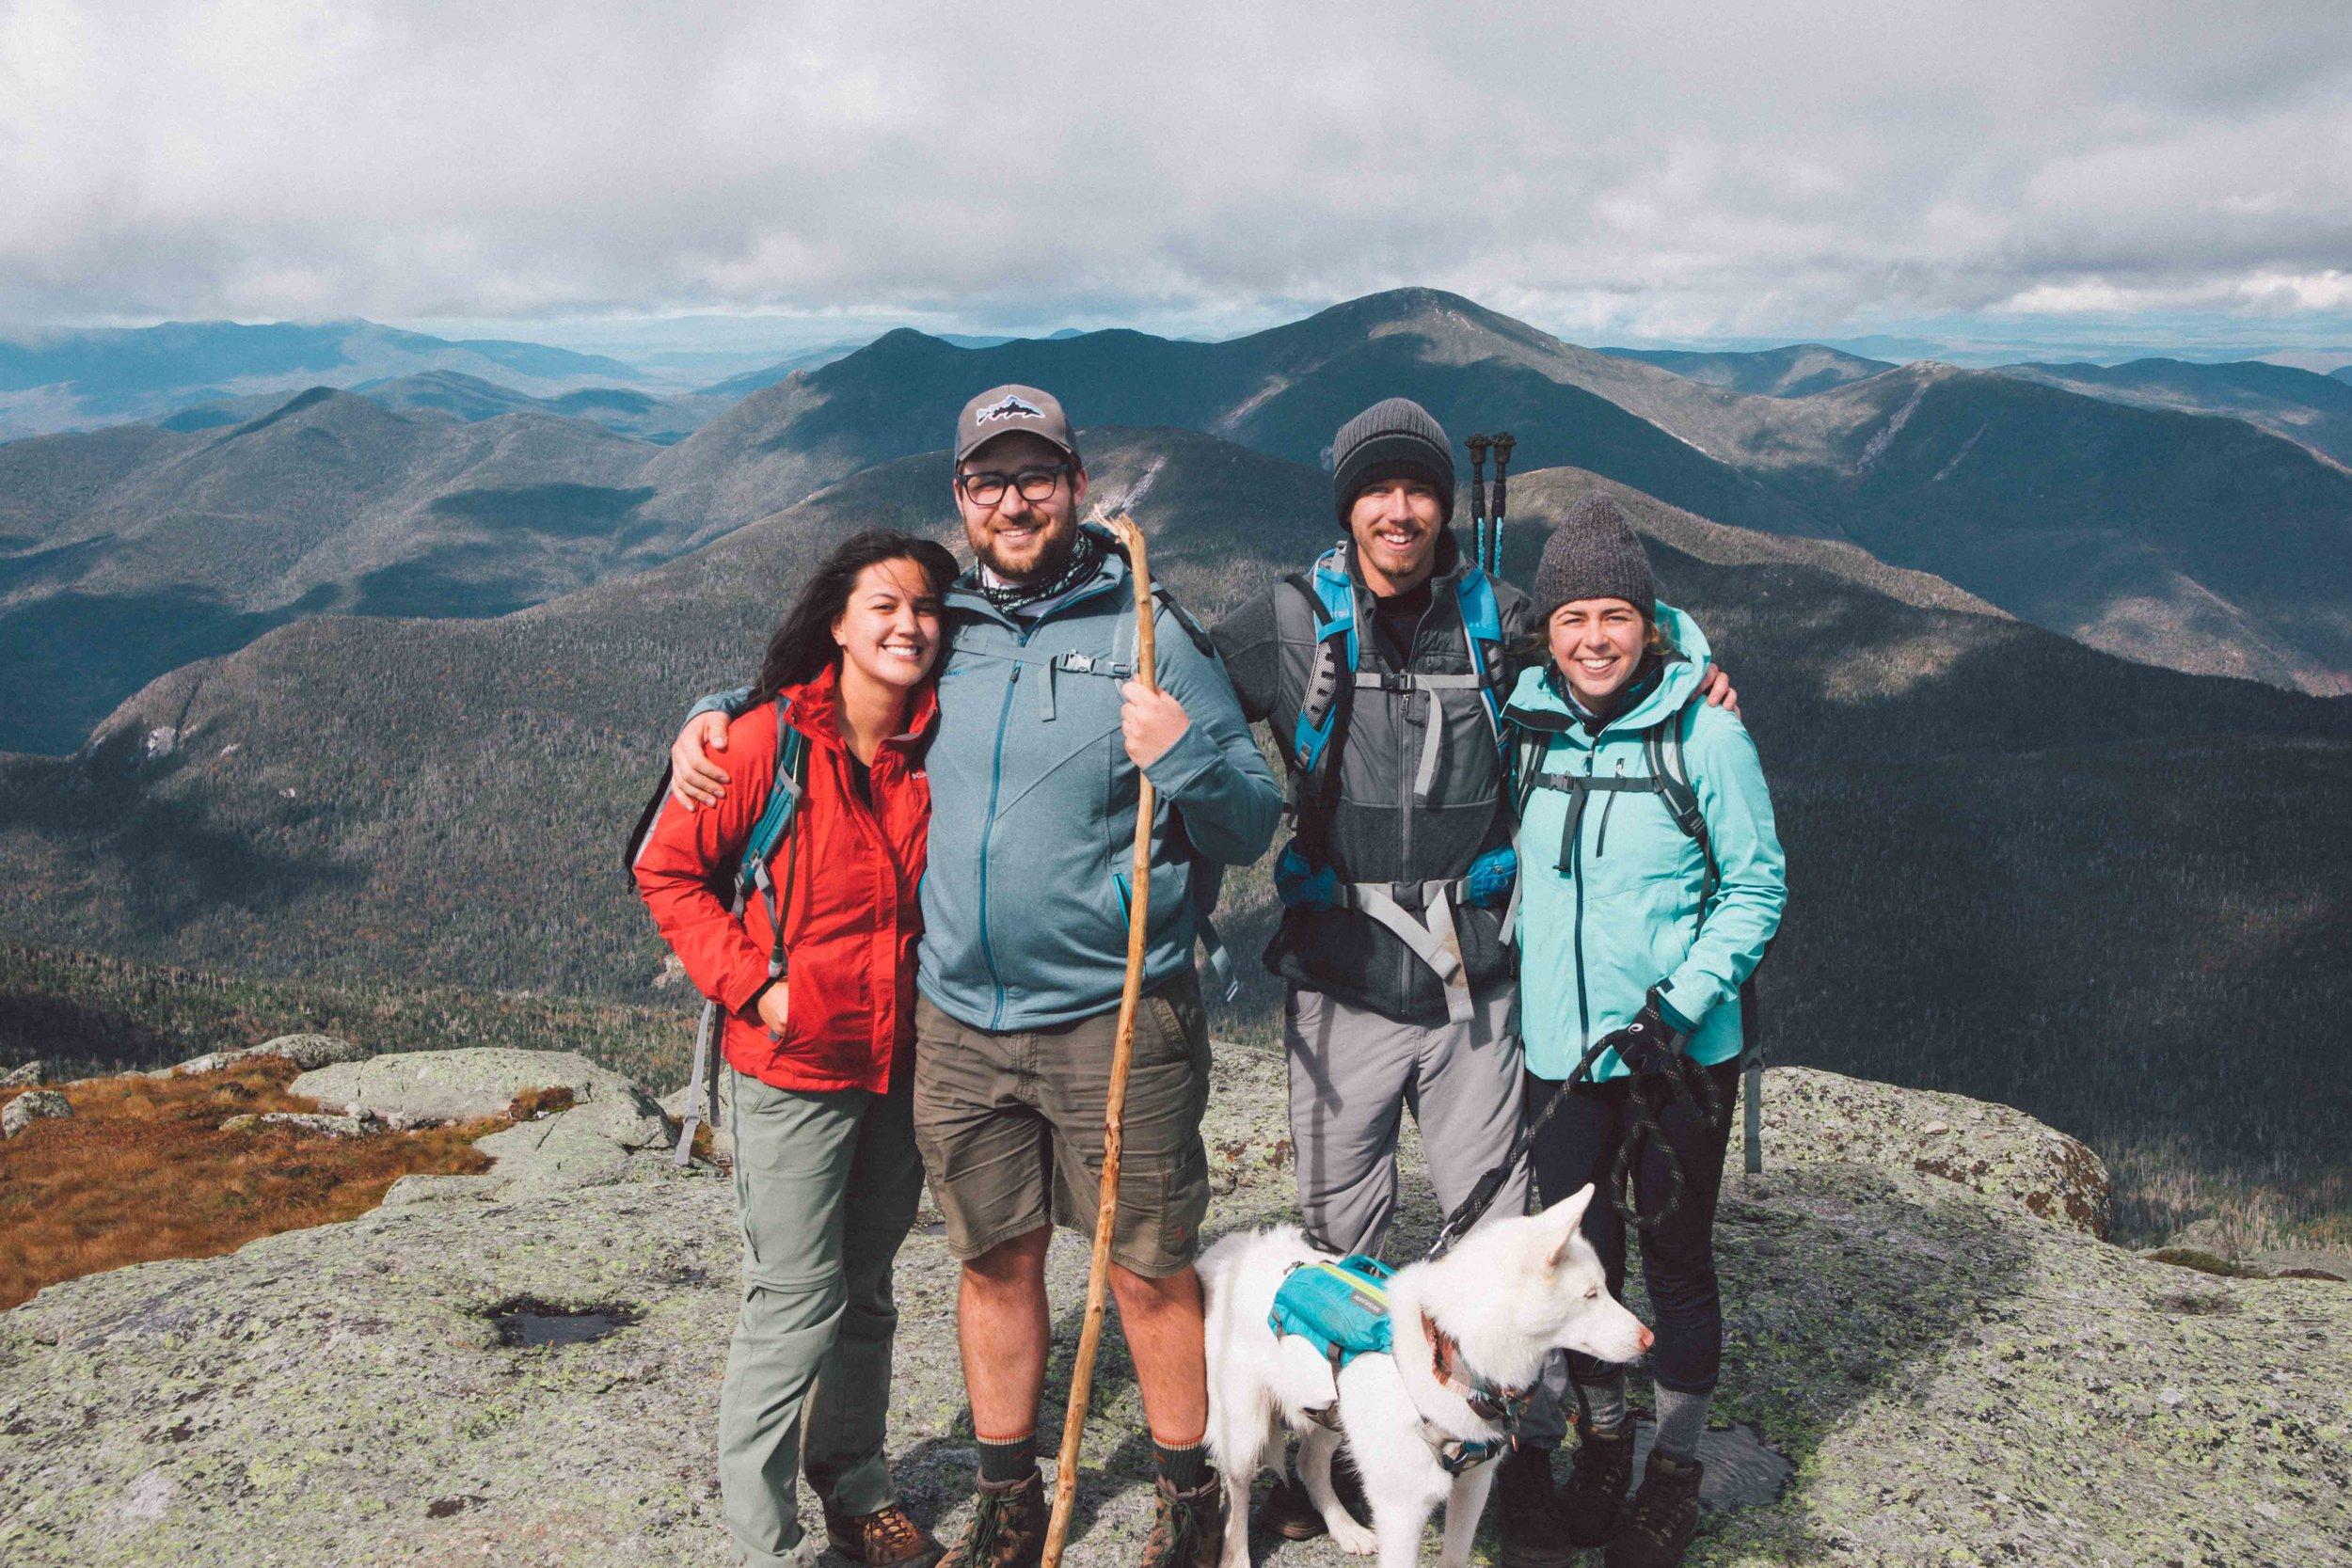 Adirondacks-2018-web-121-Mount-Marcy.jpg